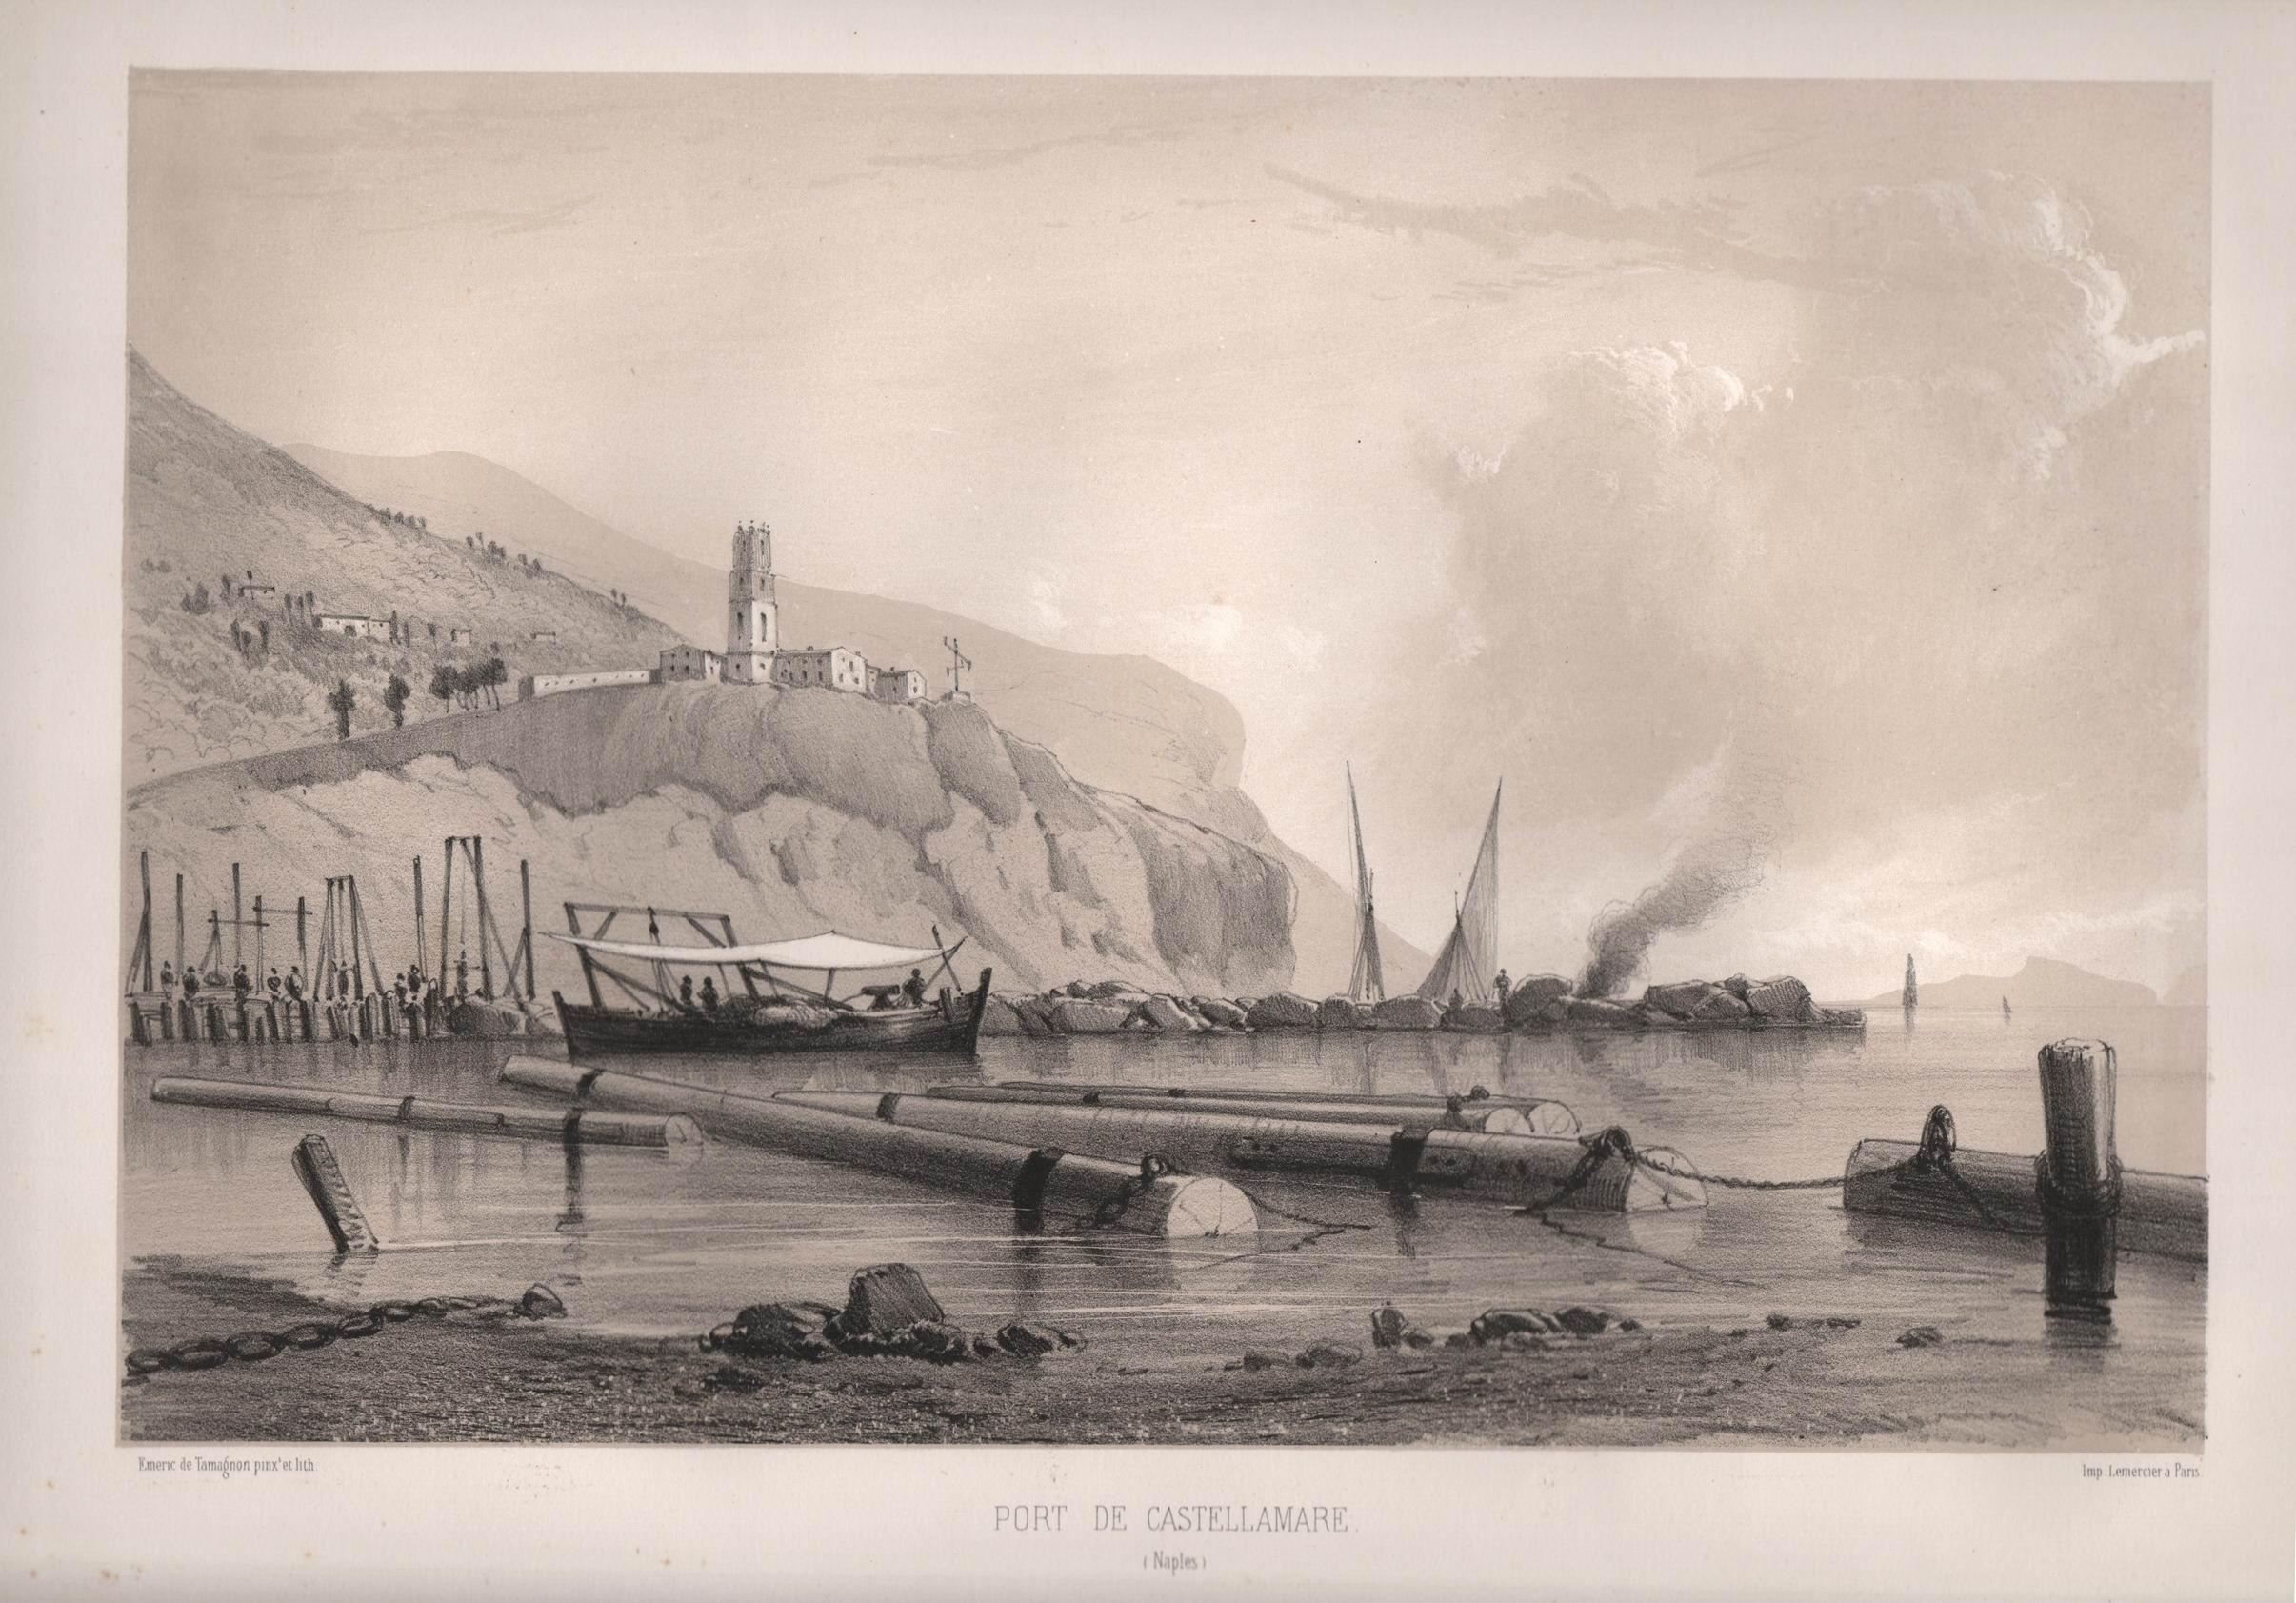 Port de Castellamare, Paris 1855, (Collezione Gaetano Fontana)